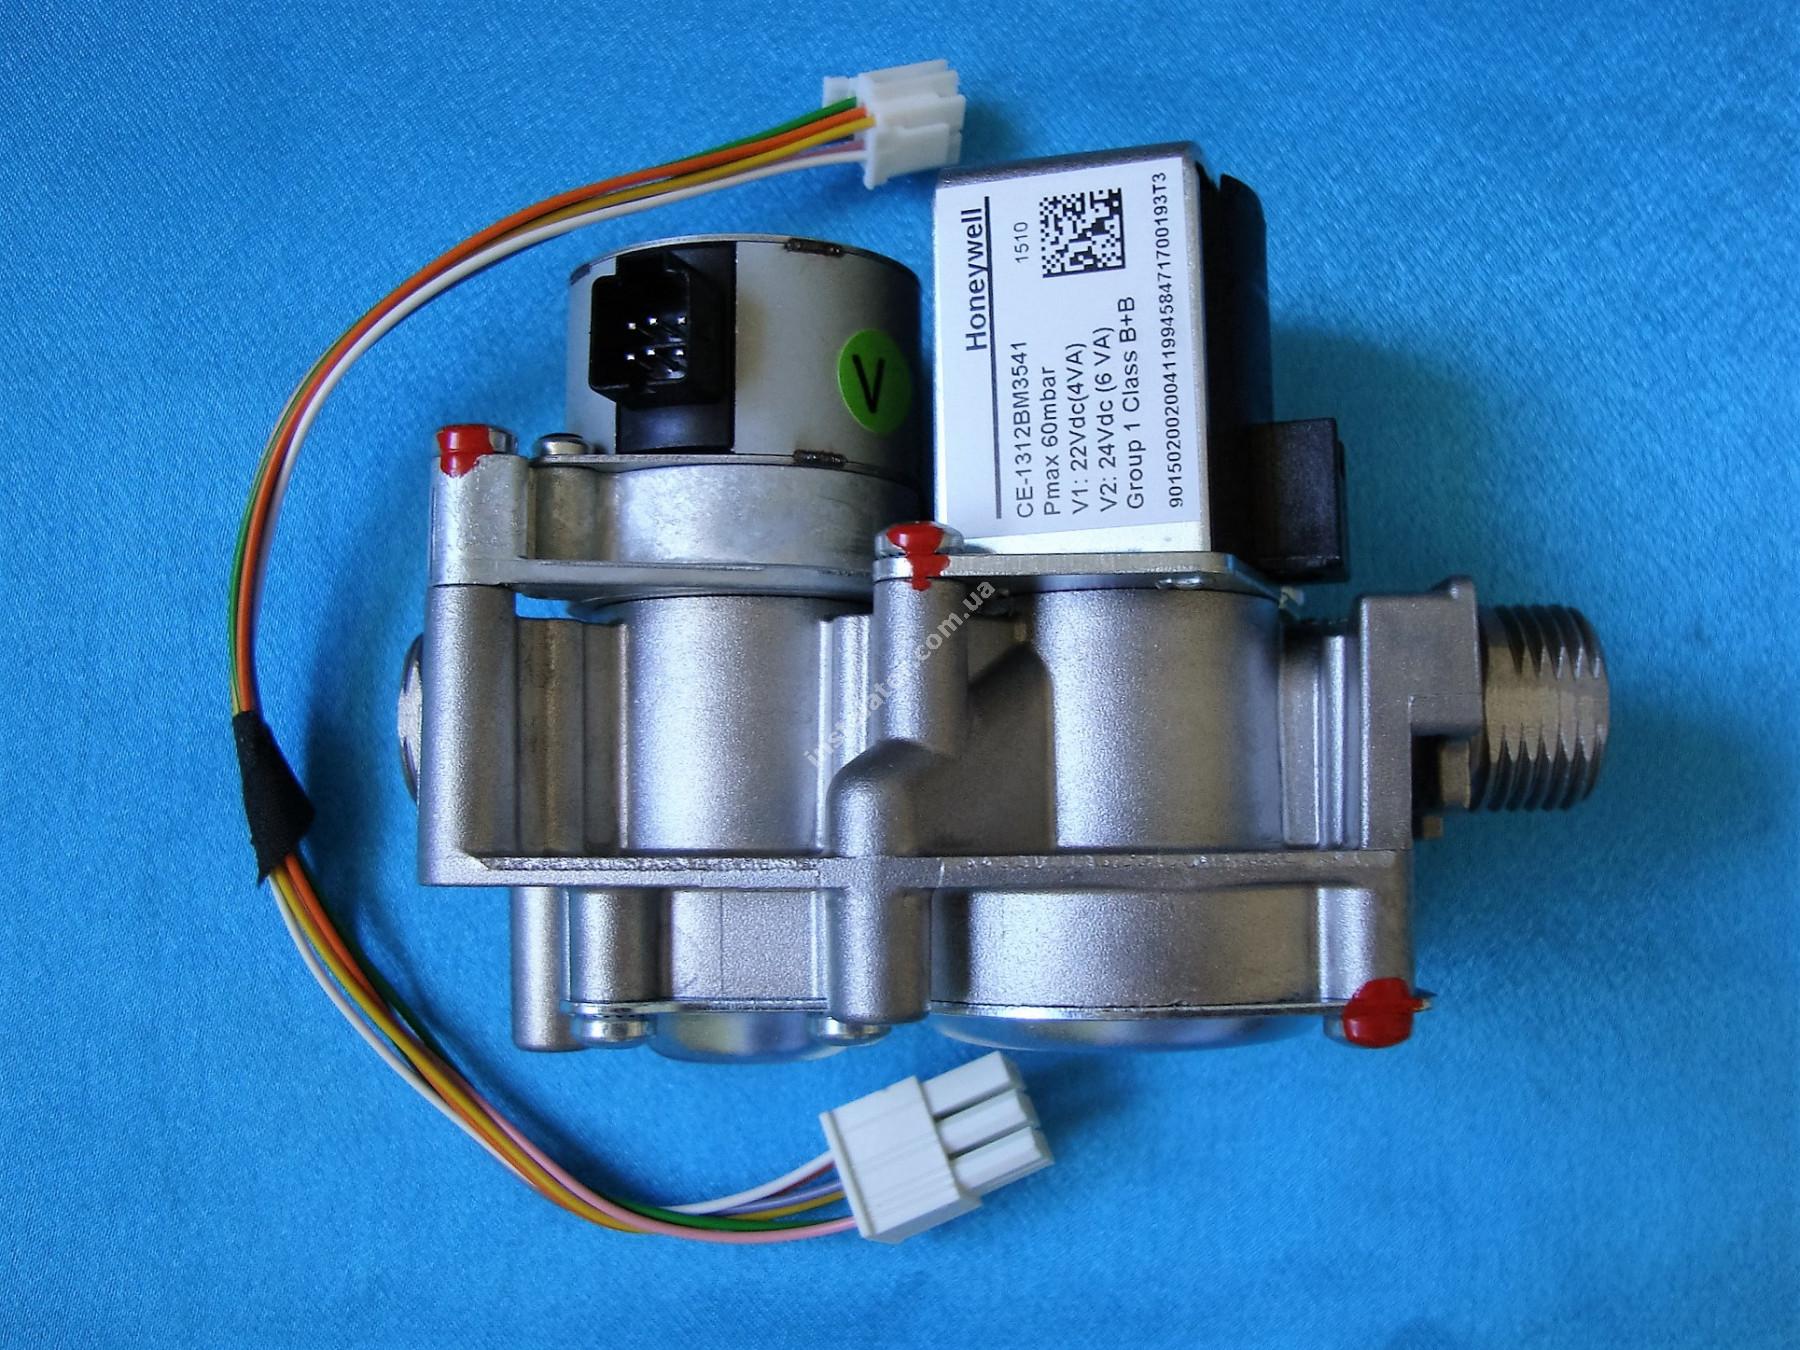 053520 Газовий клапан колонки VAILLANT MAG 16-0/0 XEA G20 (HONEYWELL CE-1312BM354) full-image-4